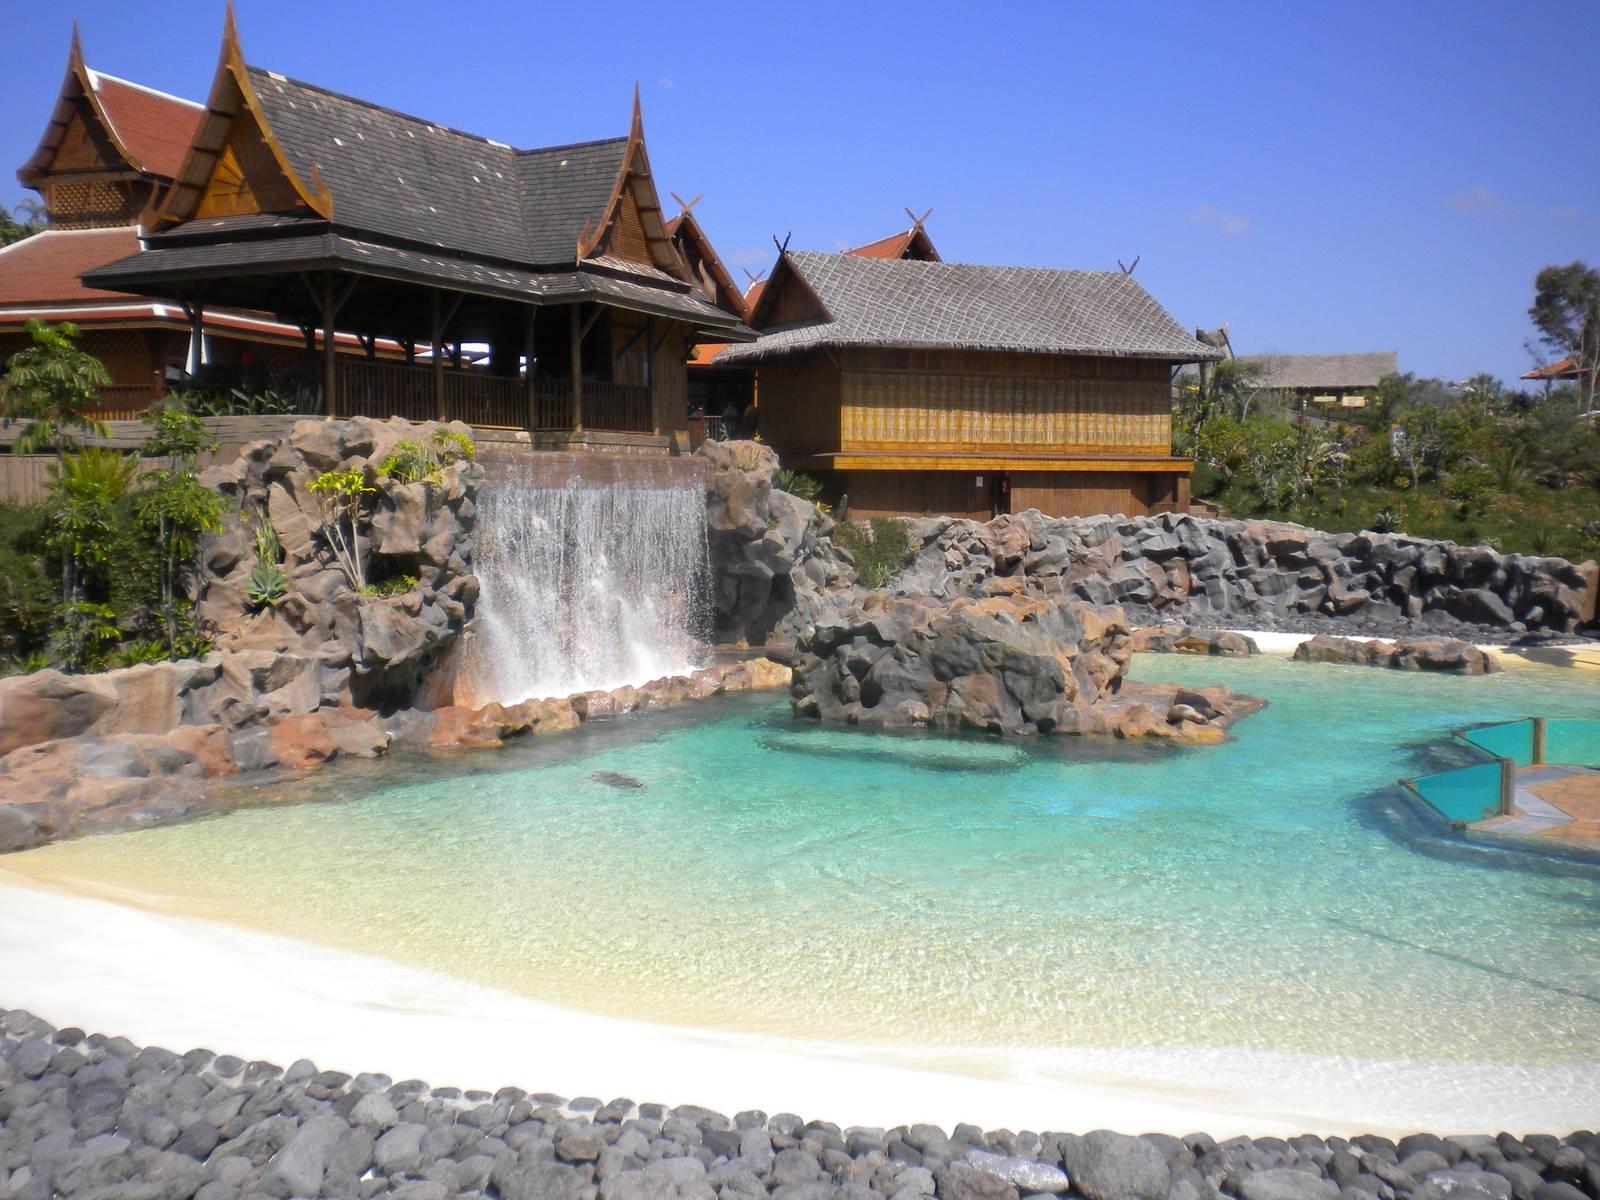 siam park18 Siam Park More Than a Water Park